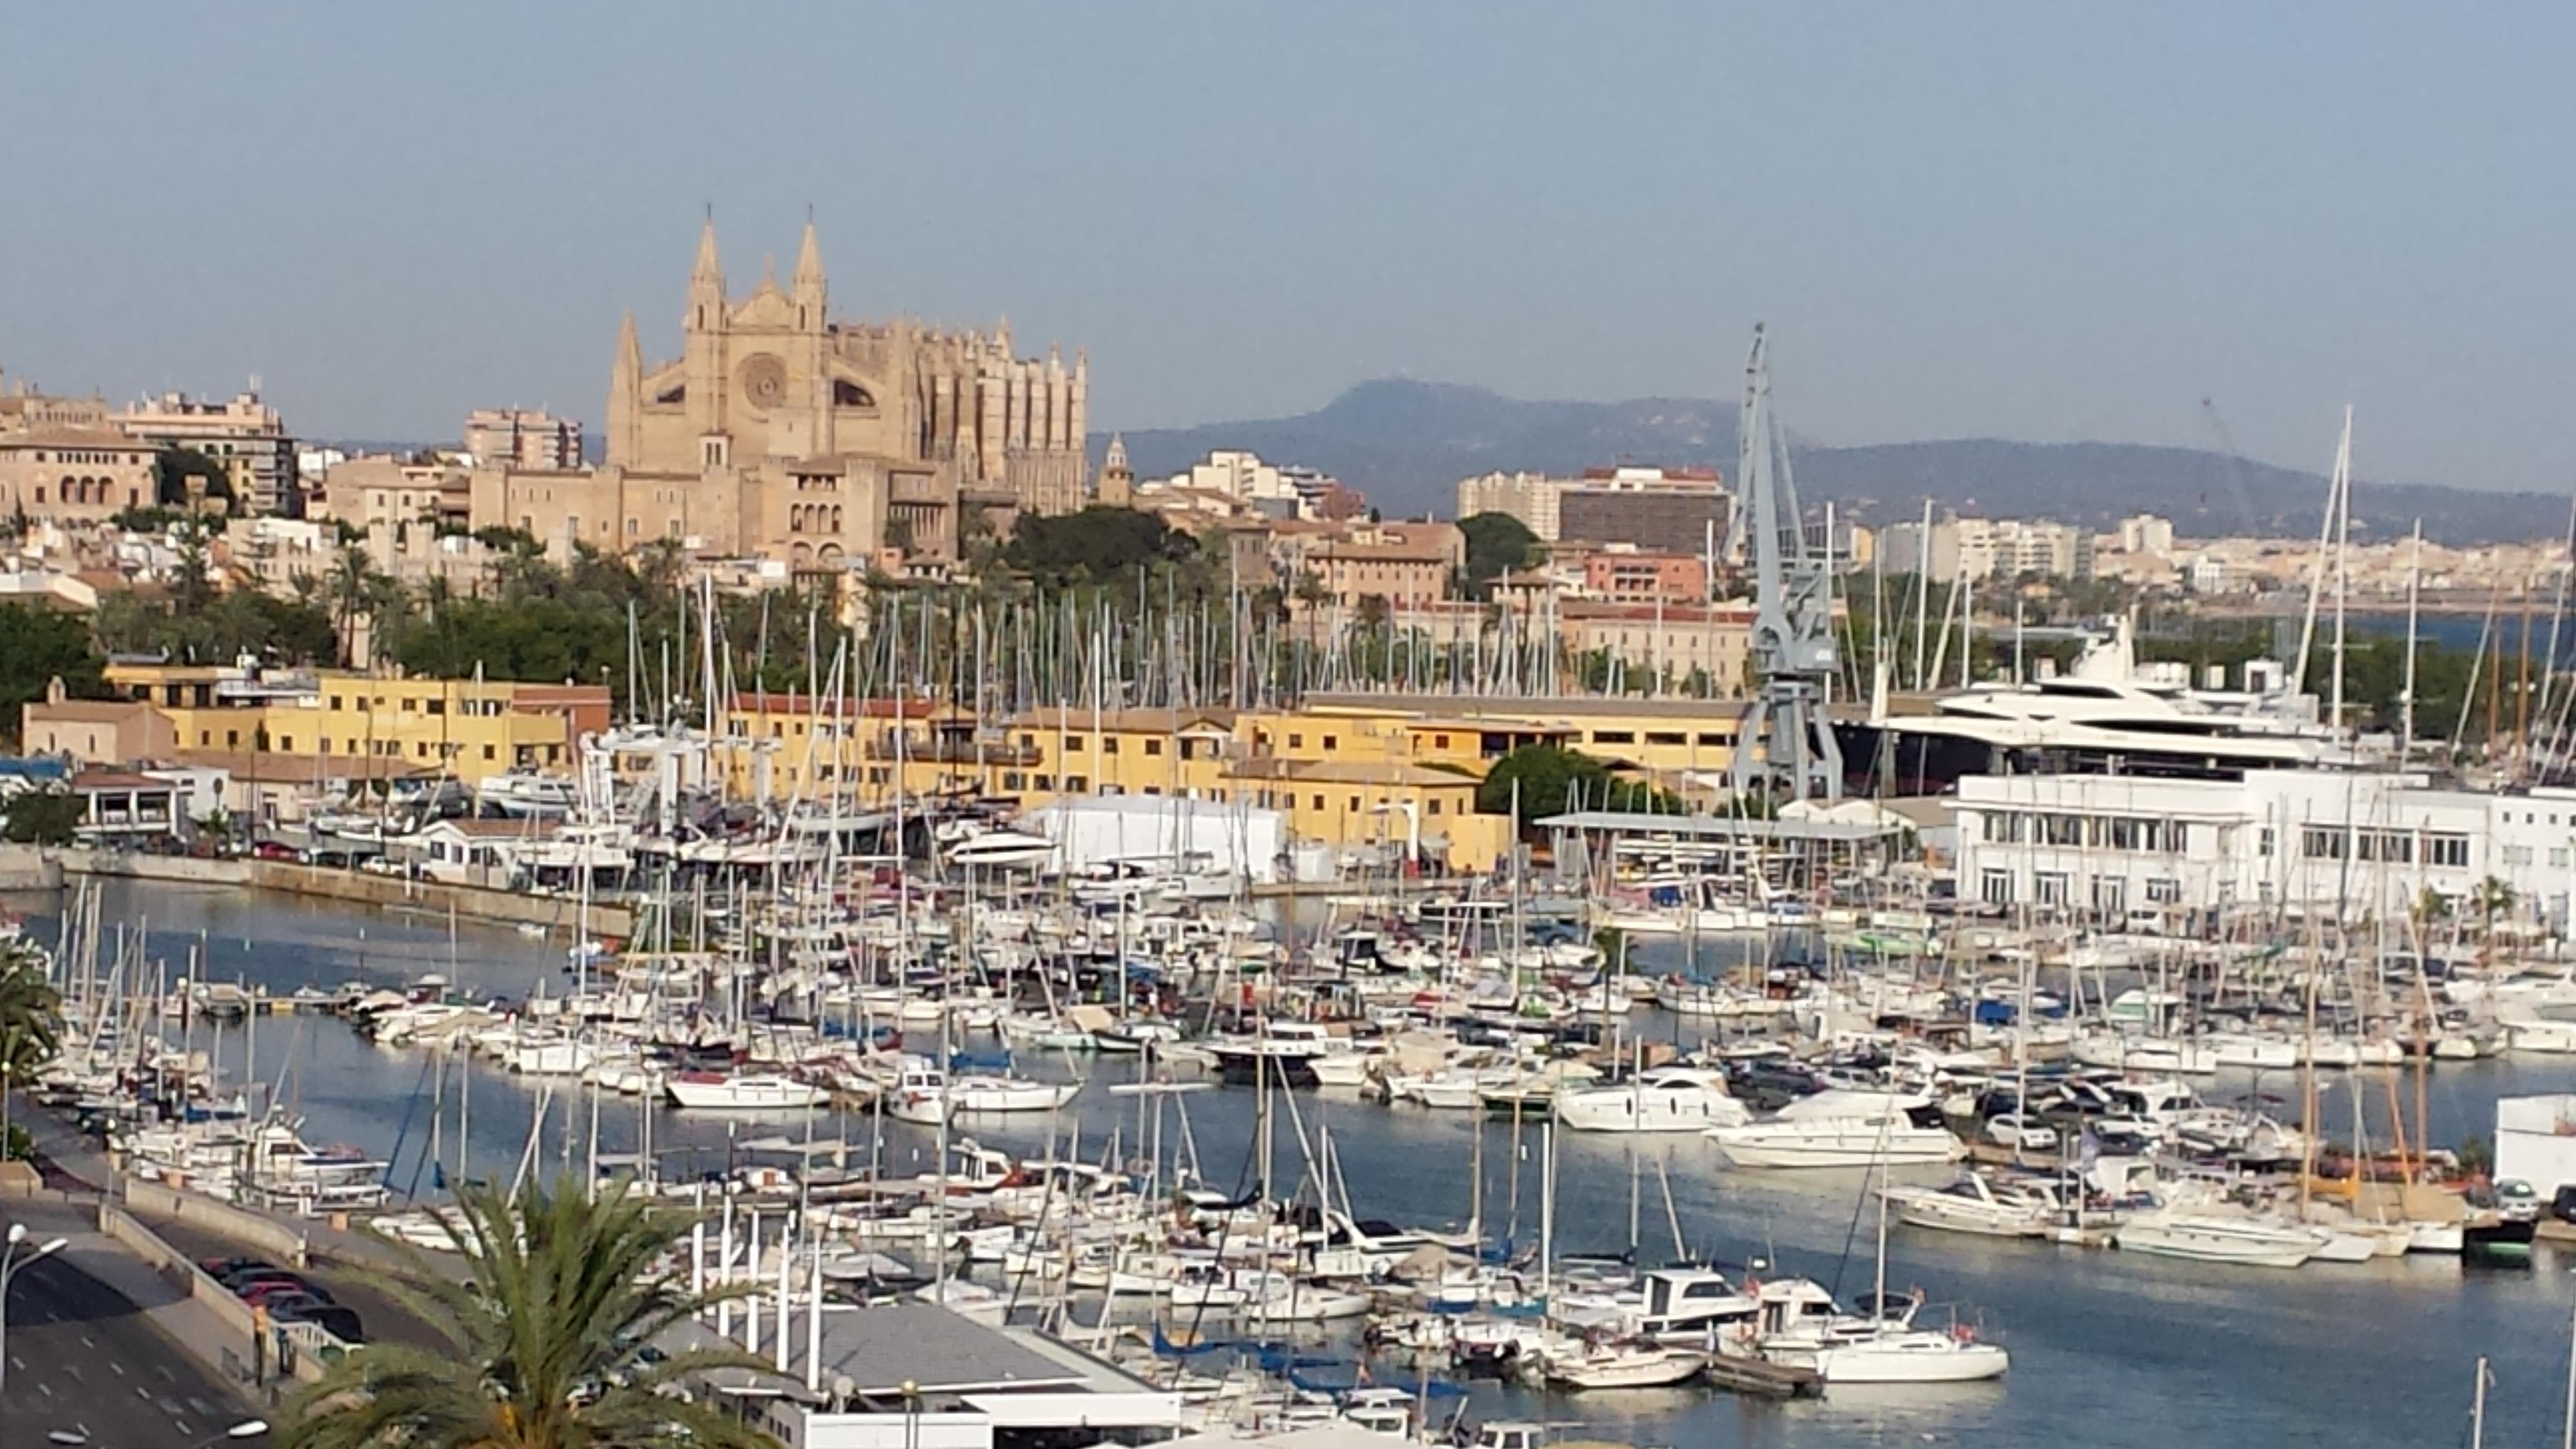 Kathrdrale von Palma de Mallorca